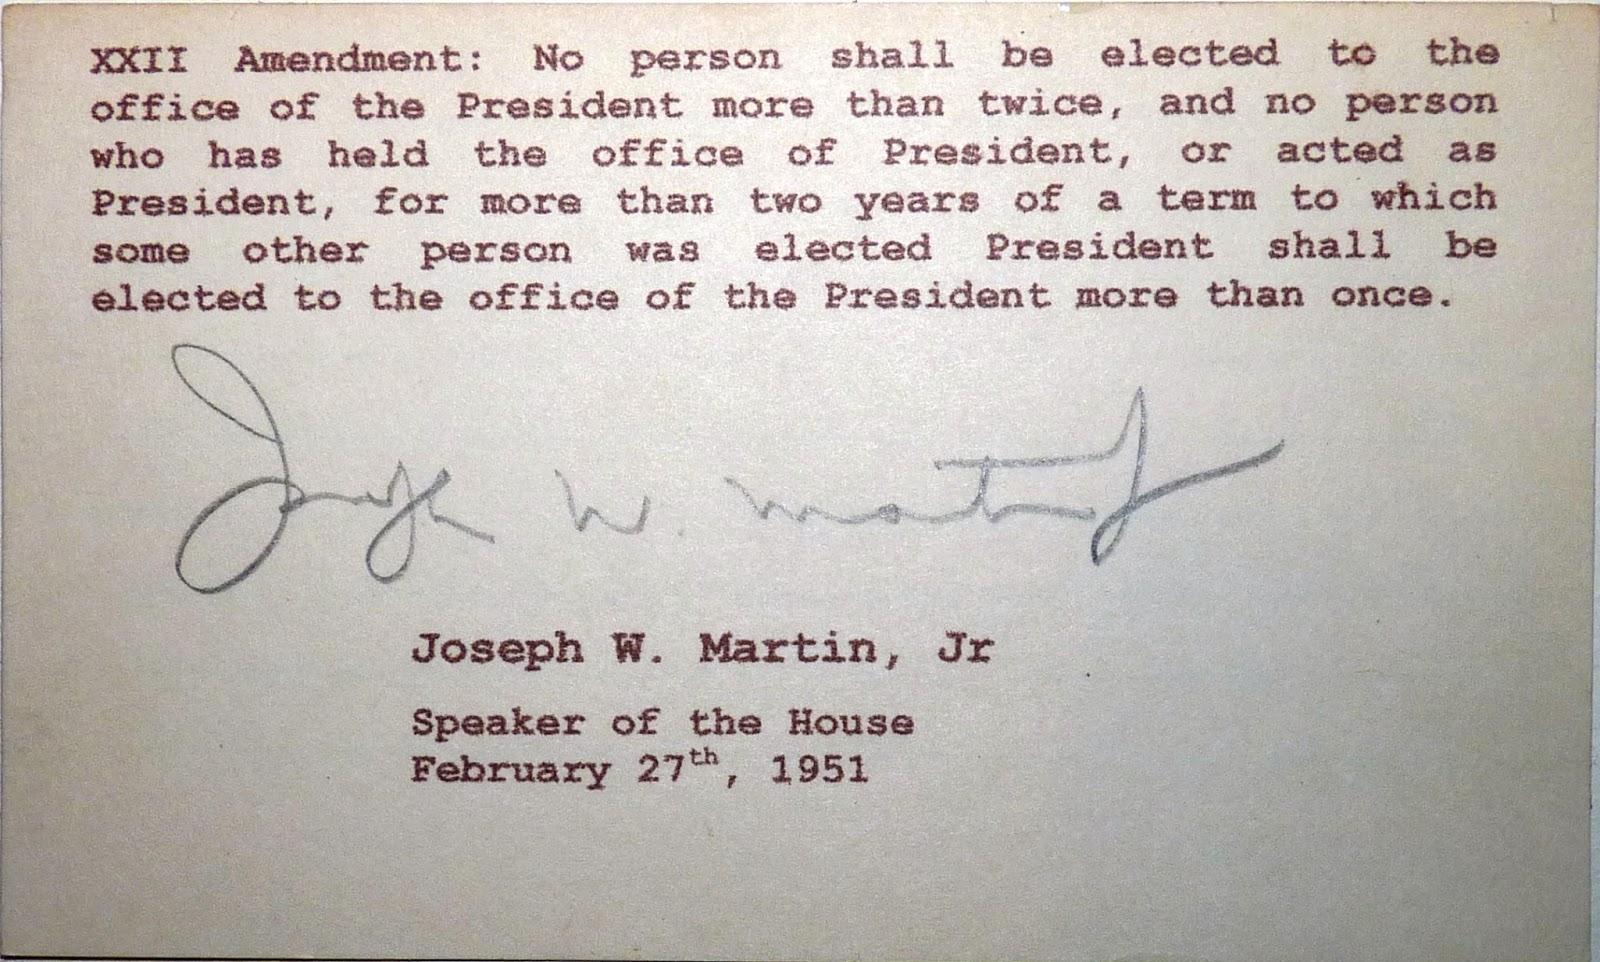 American History 22nd Amendment - #AmericanHistory - The 22nd Amendment #influence #leadership #FrizeMedia